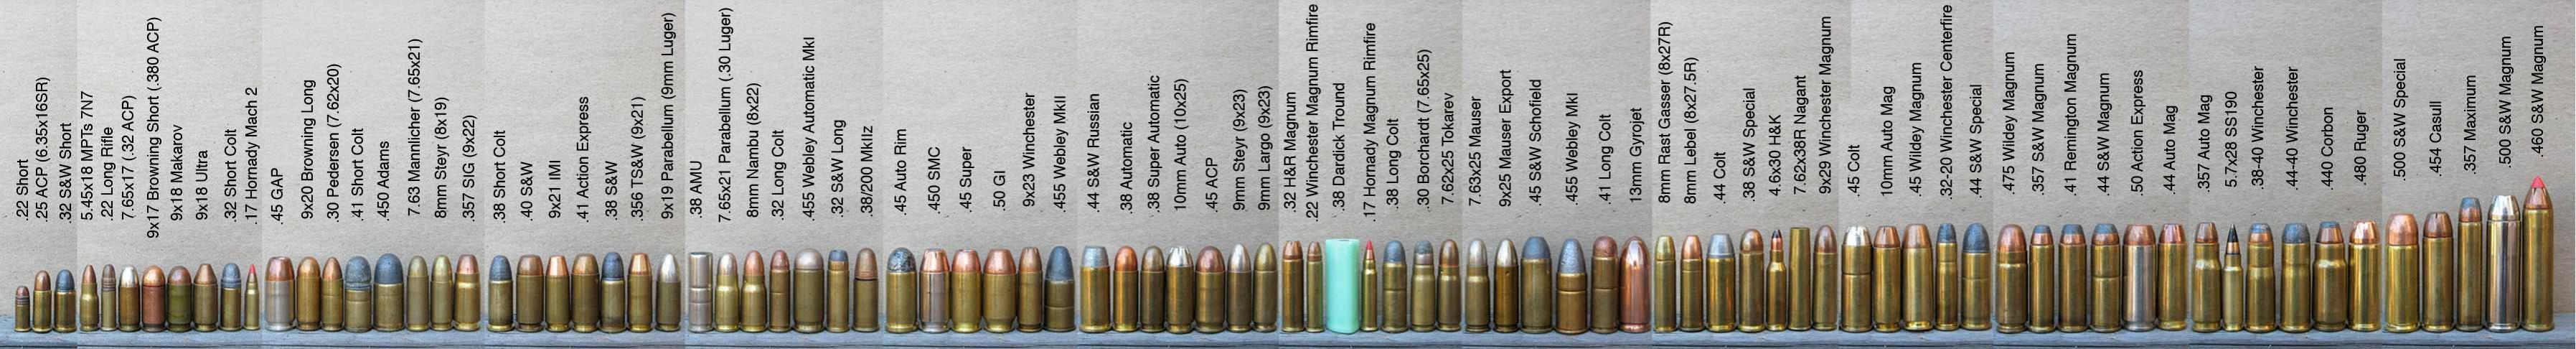 Handgun Ammo visual comparison, for reference-handgun_lineup_horizontal.jpg